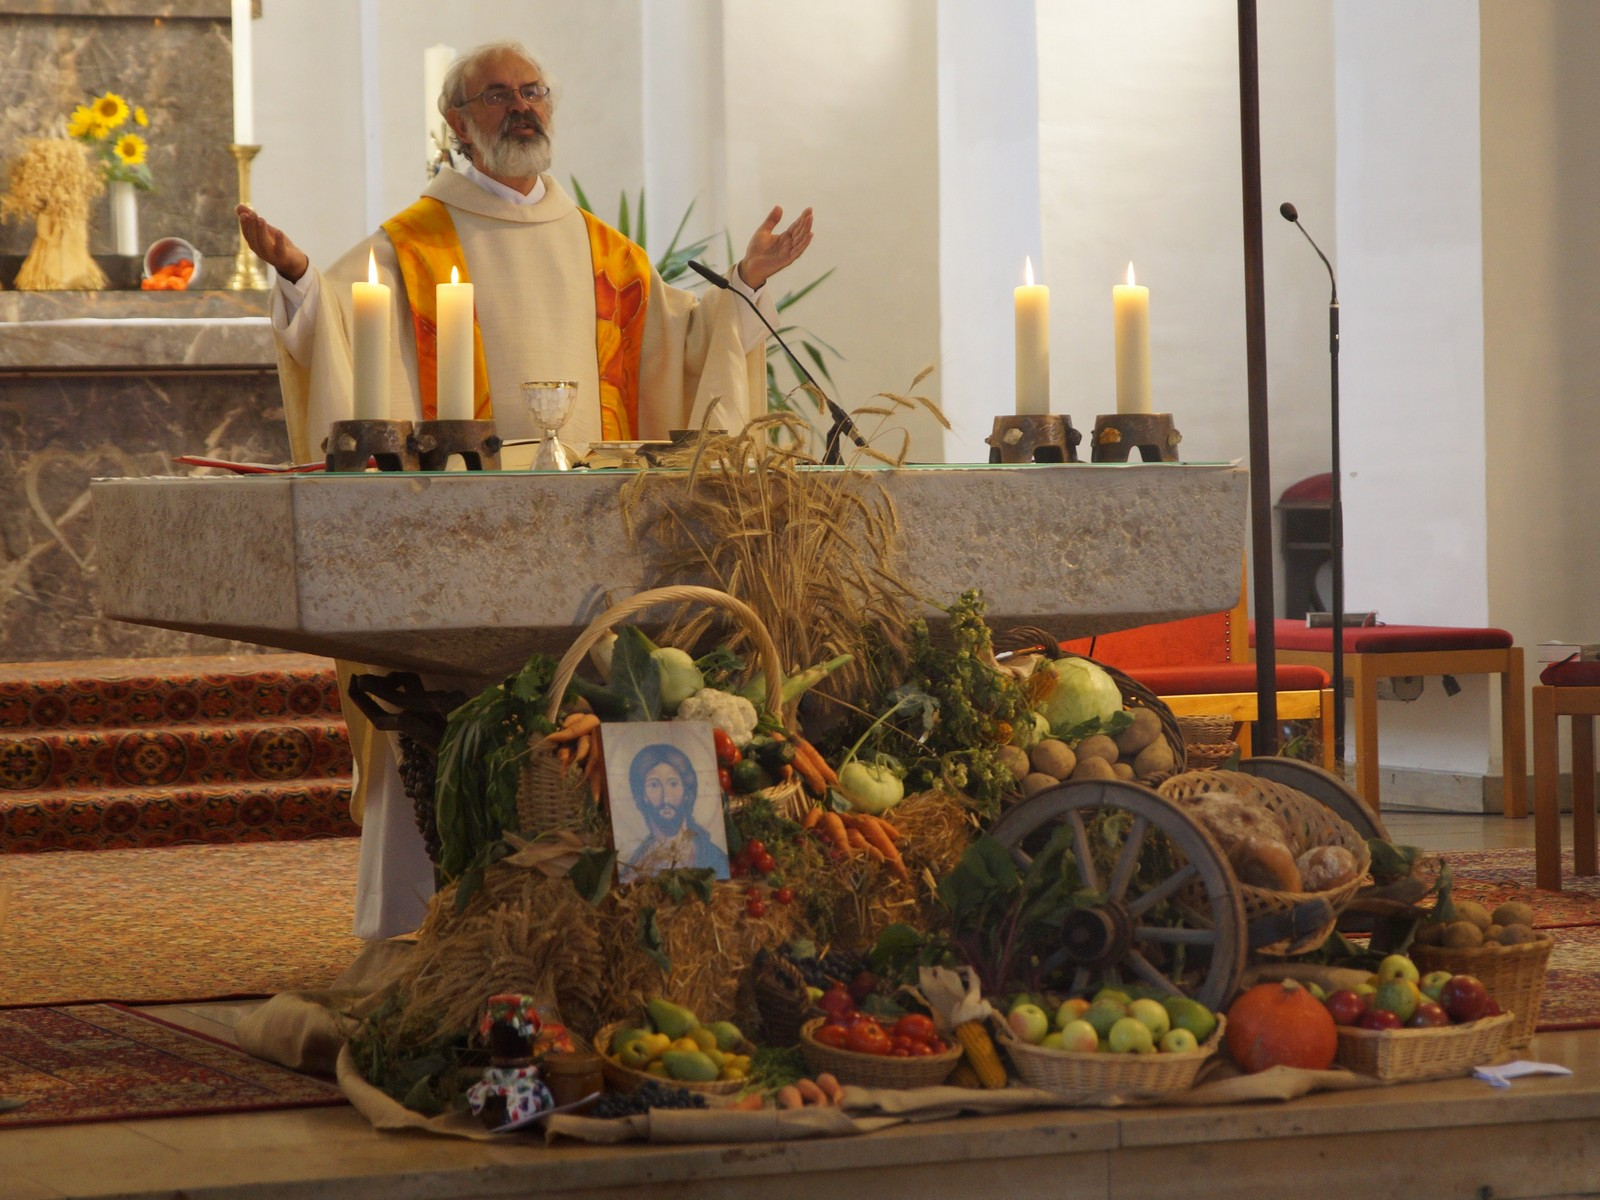 20180930-Erntedank Pfarrei Schwarzenfeld mit Gruppen Piccolo und ContactDSC03444